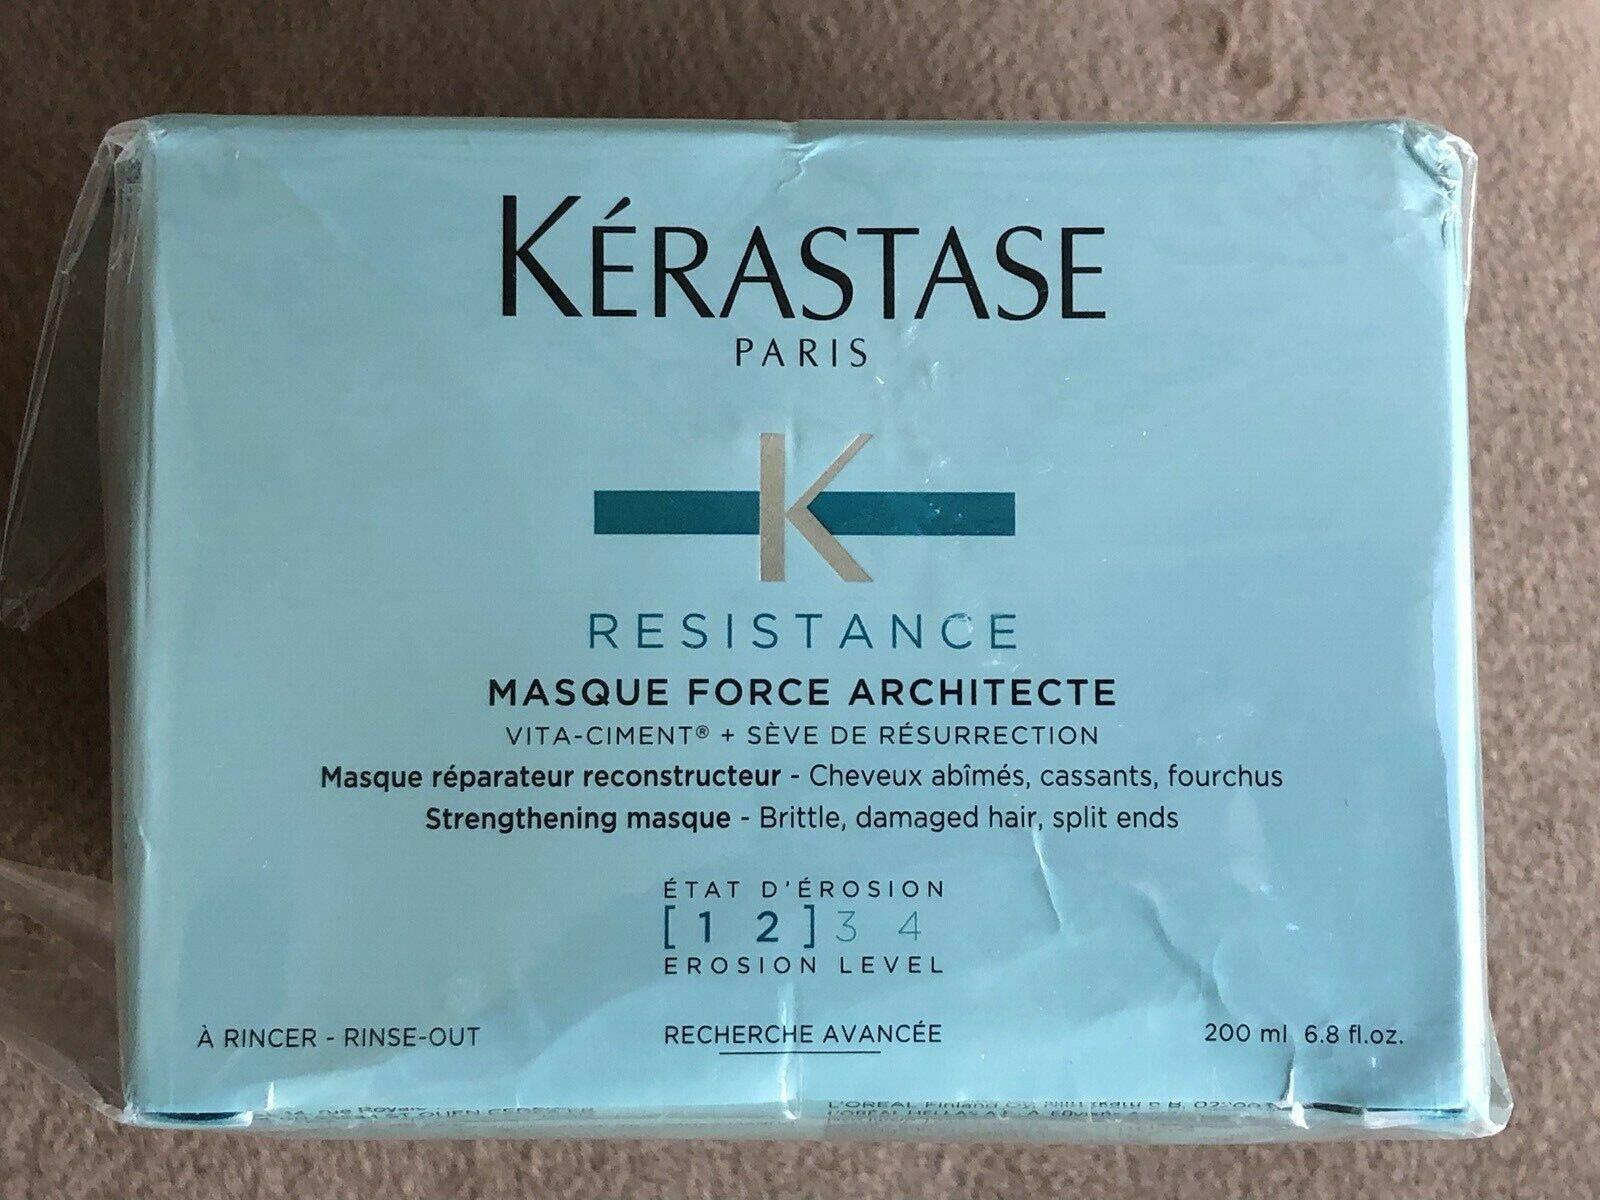 Kerastase RESISTANCE Masque Force Architecte Hair Mask  6.8o